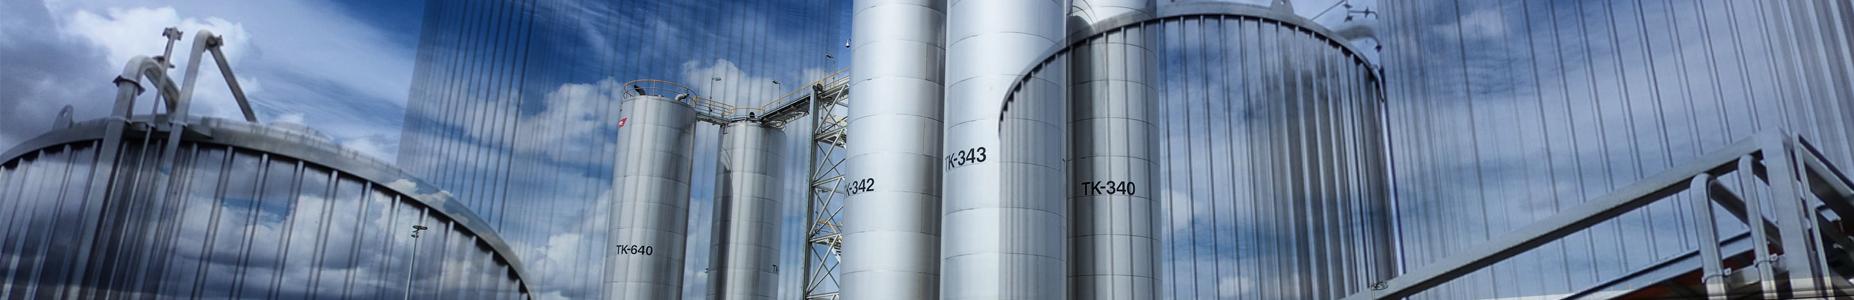 Stainless Steel Vessels Suppliers, custom design